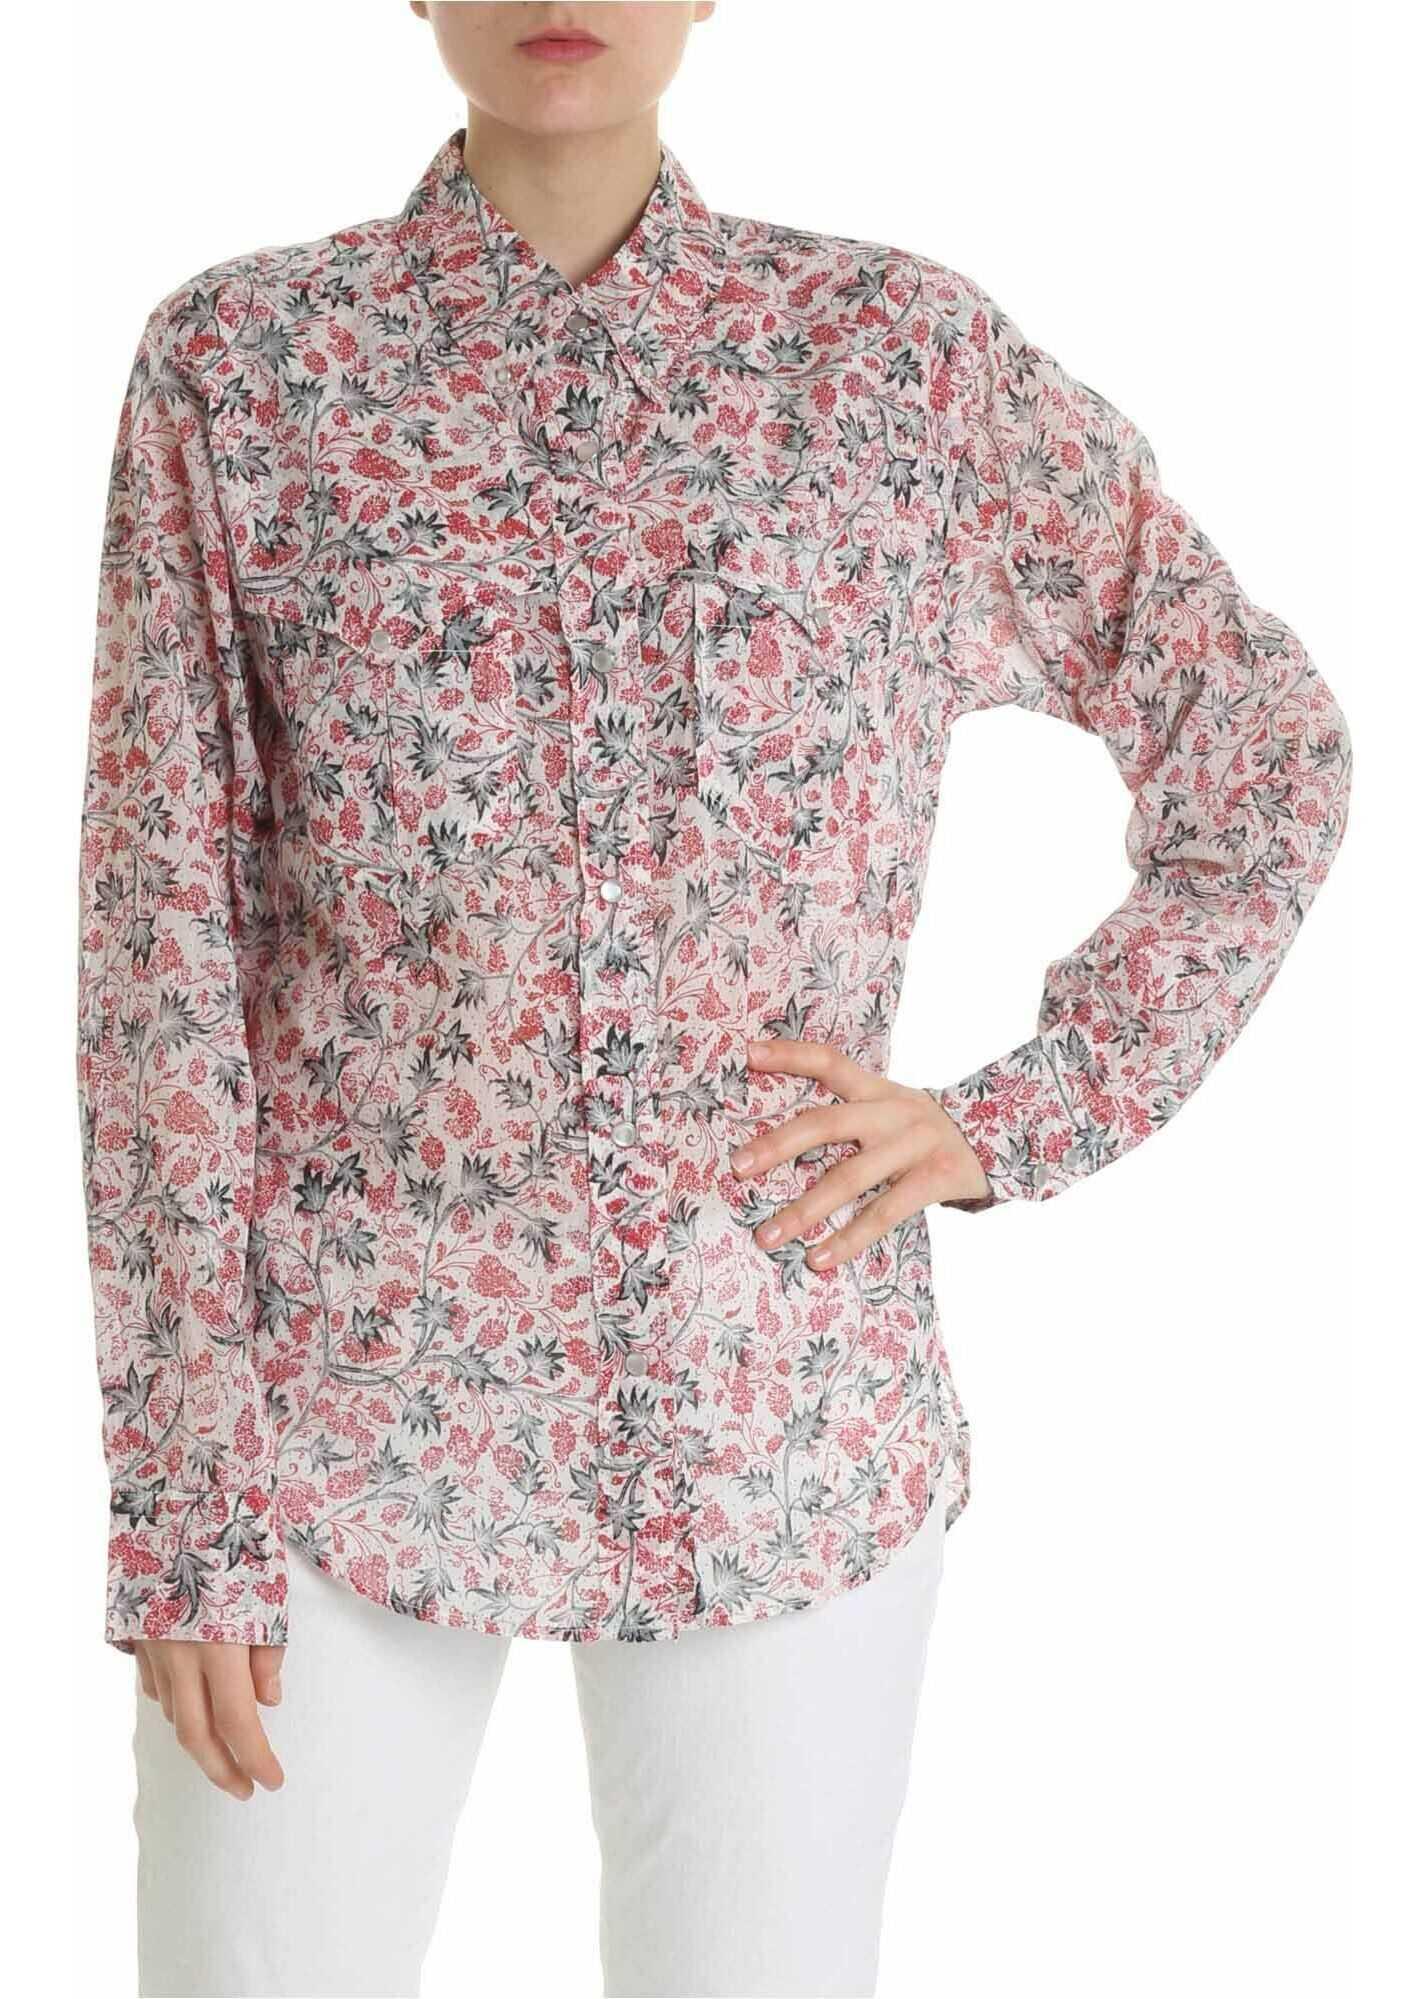 Isabel Marant Emelina Shirt With Floral Motif White